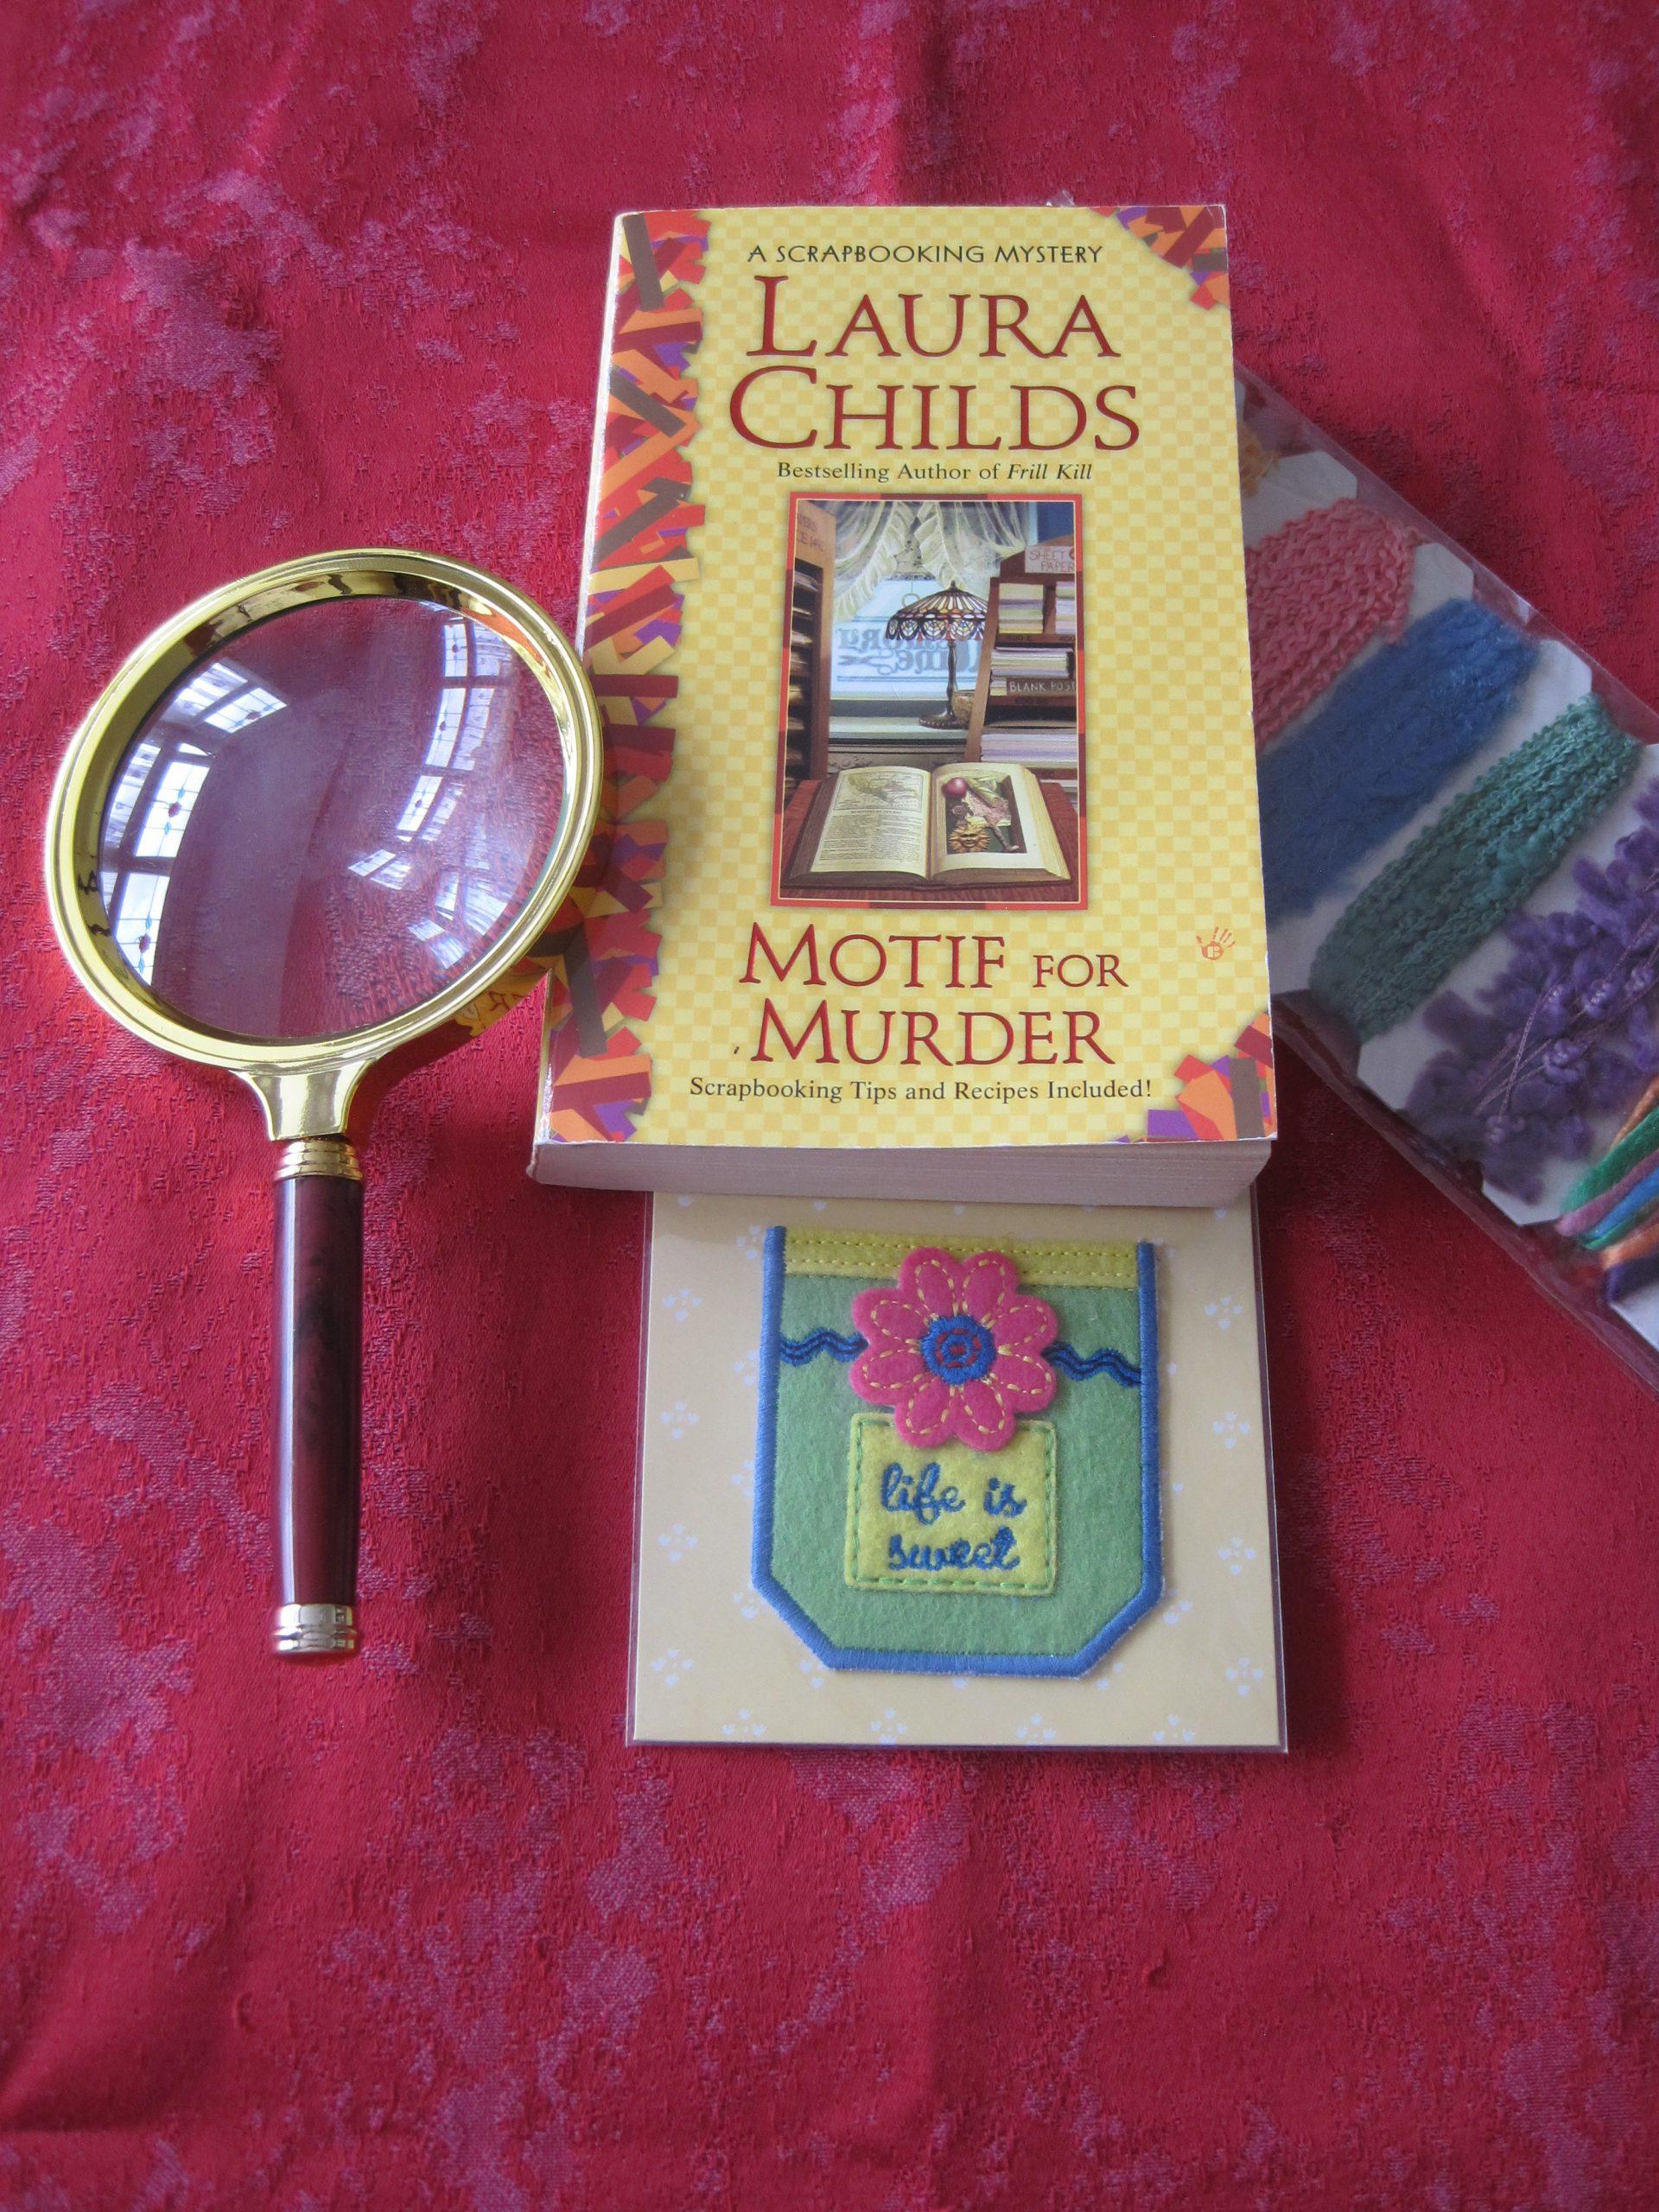 Motif for Murder - photo by Juliamaud